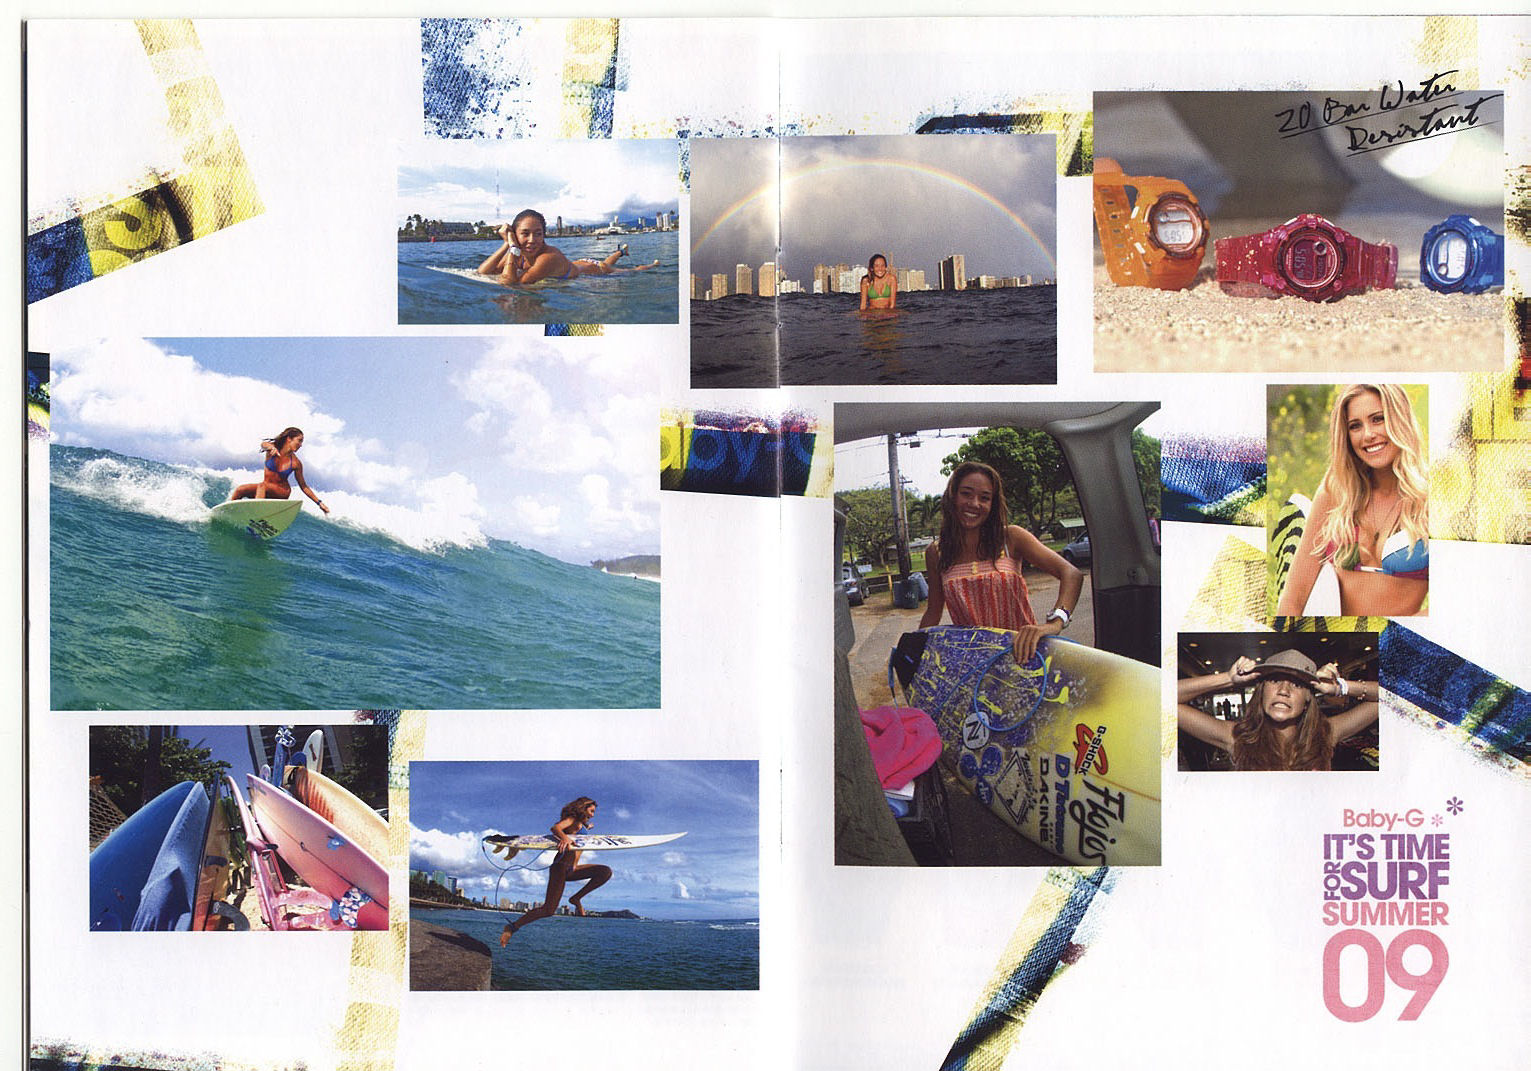 Casio-G-Shock-Surf-Collection-Summer-2009-Page-7.jpg